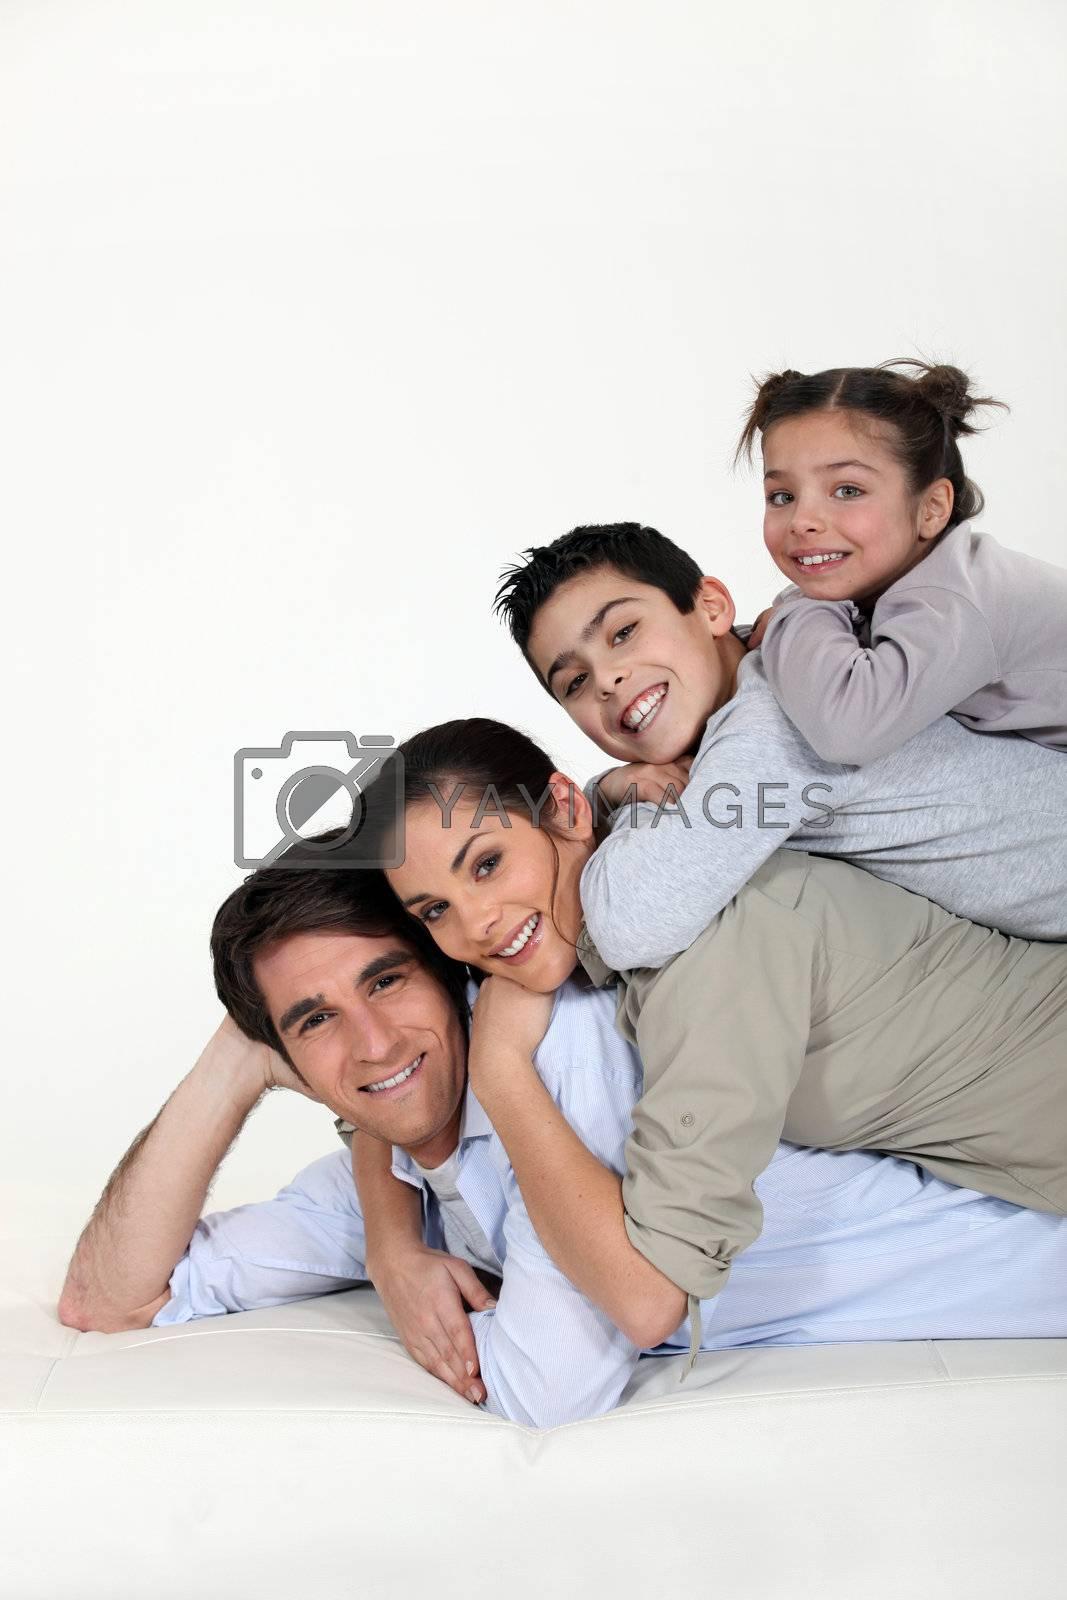 a family pyramid by phovoir